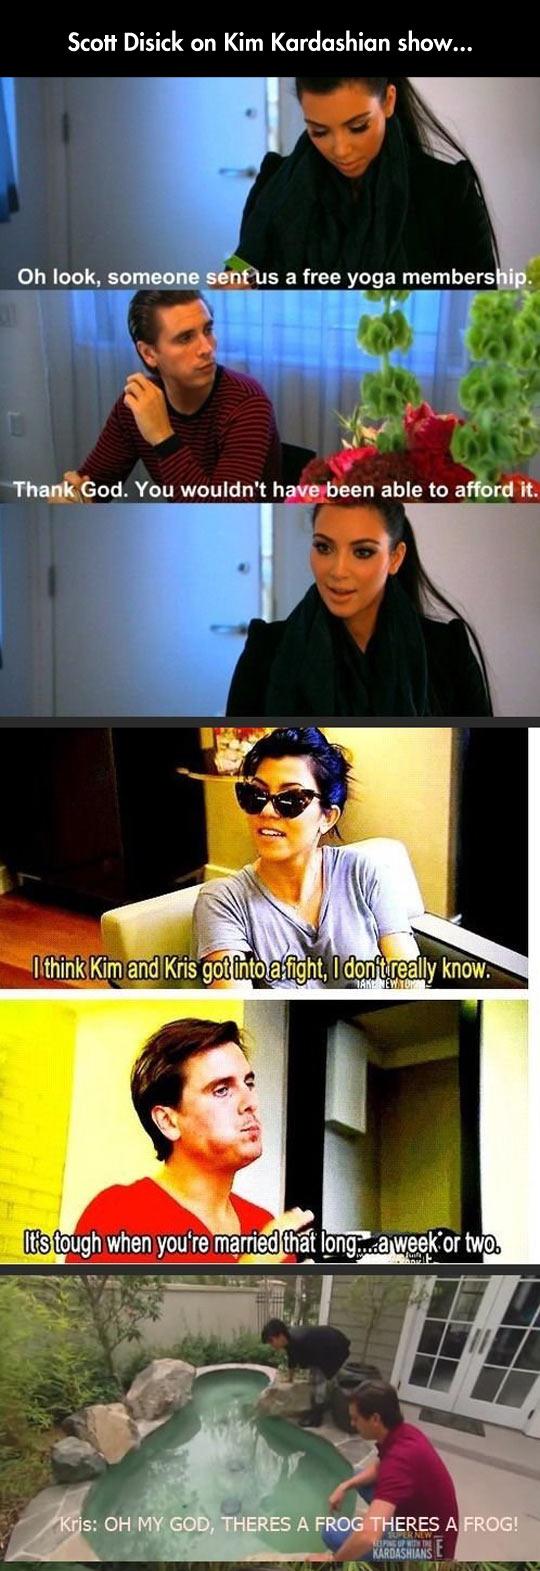 funny-Kim-Kardashian-Scott-Disick-show